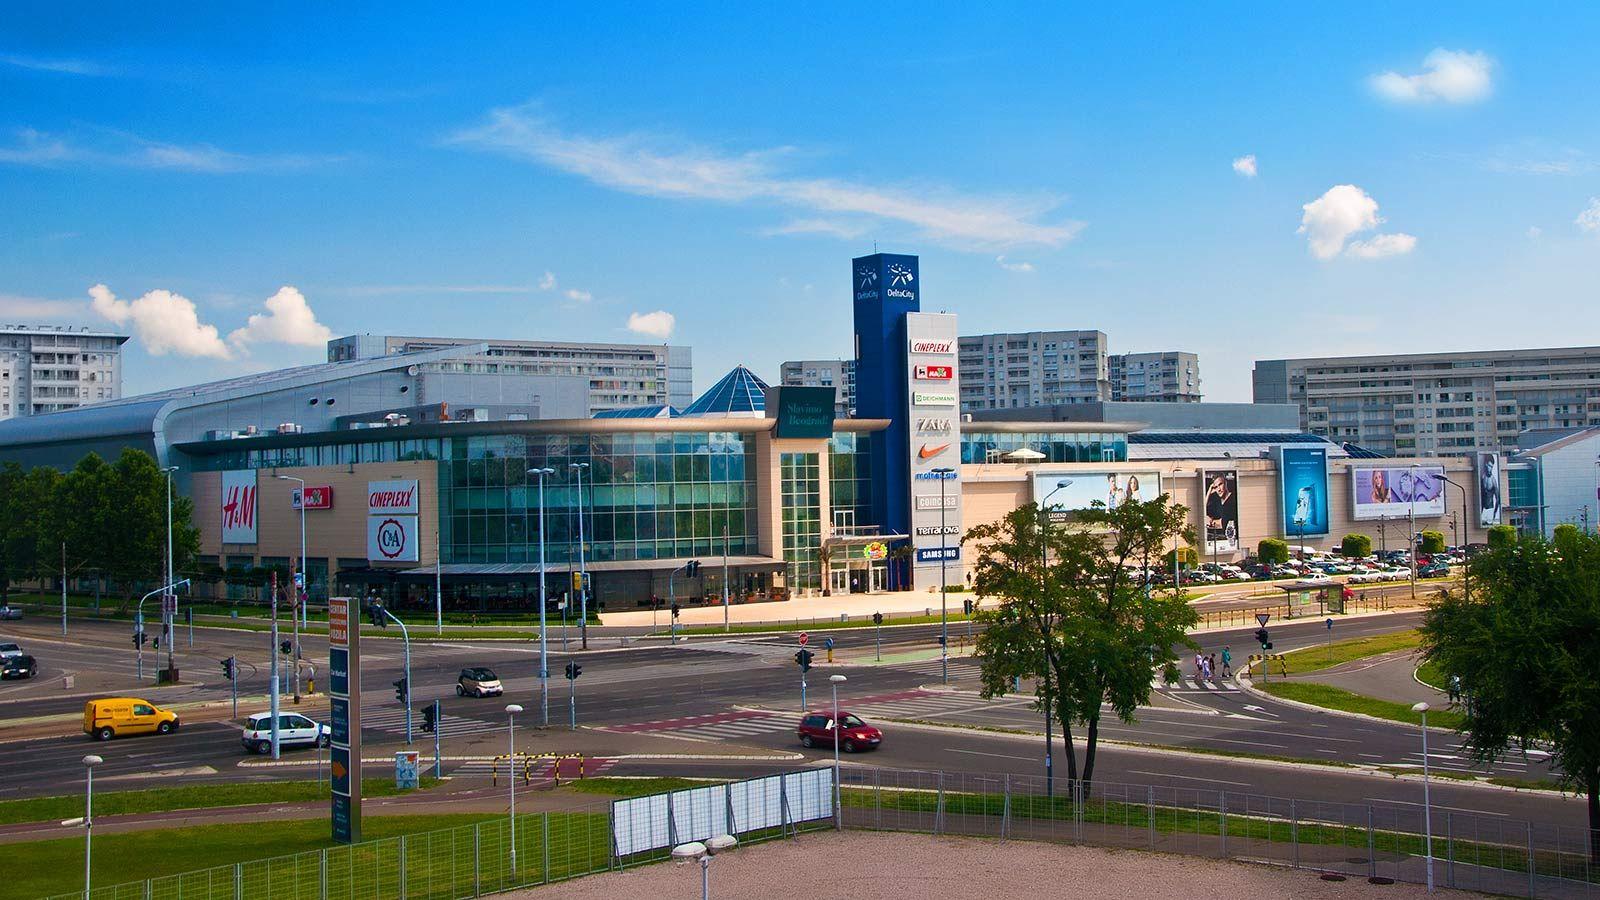 Delta City Belgrade Building Aerial View - Mace Group